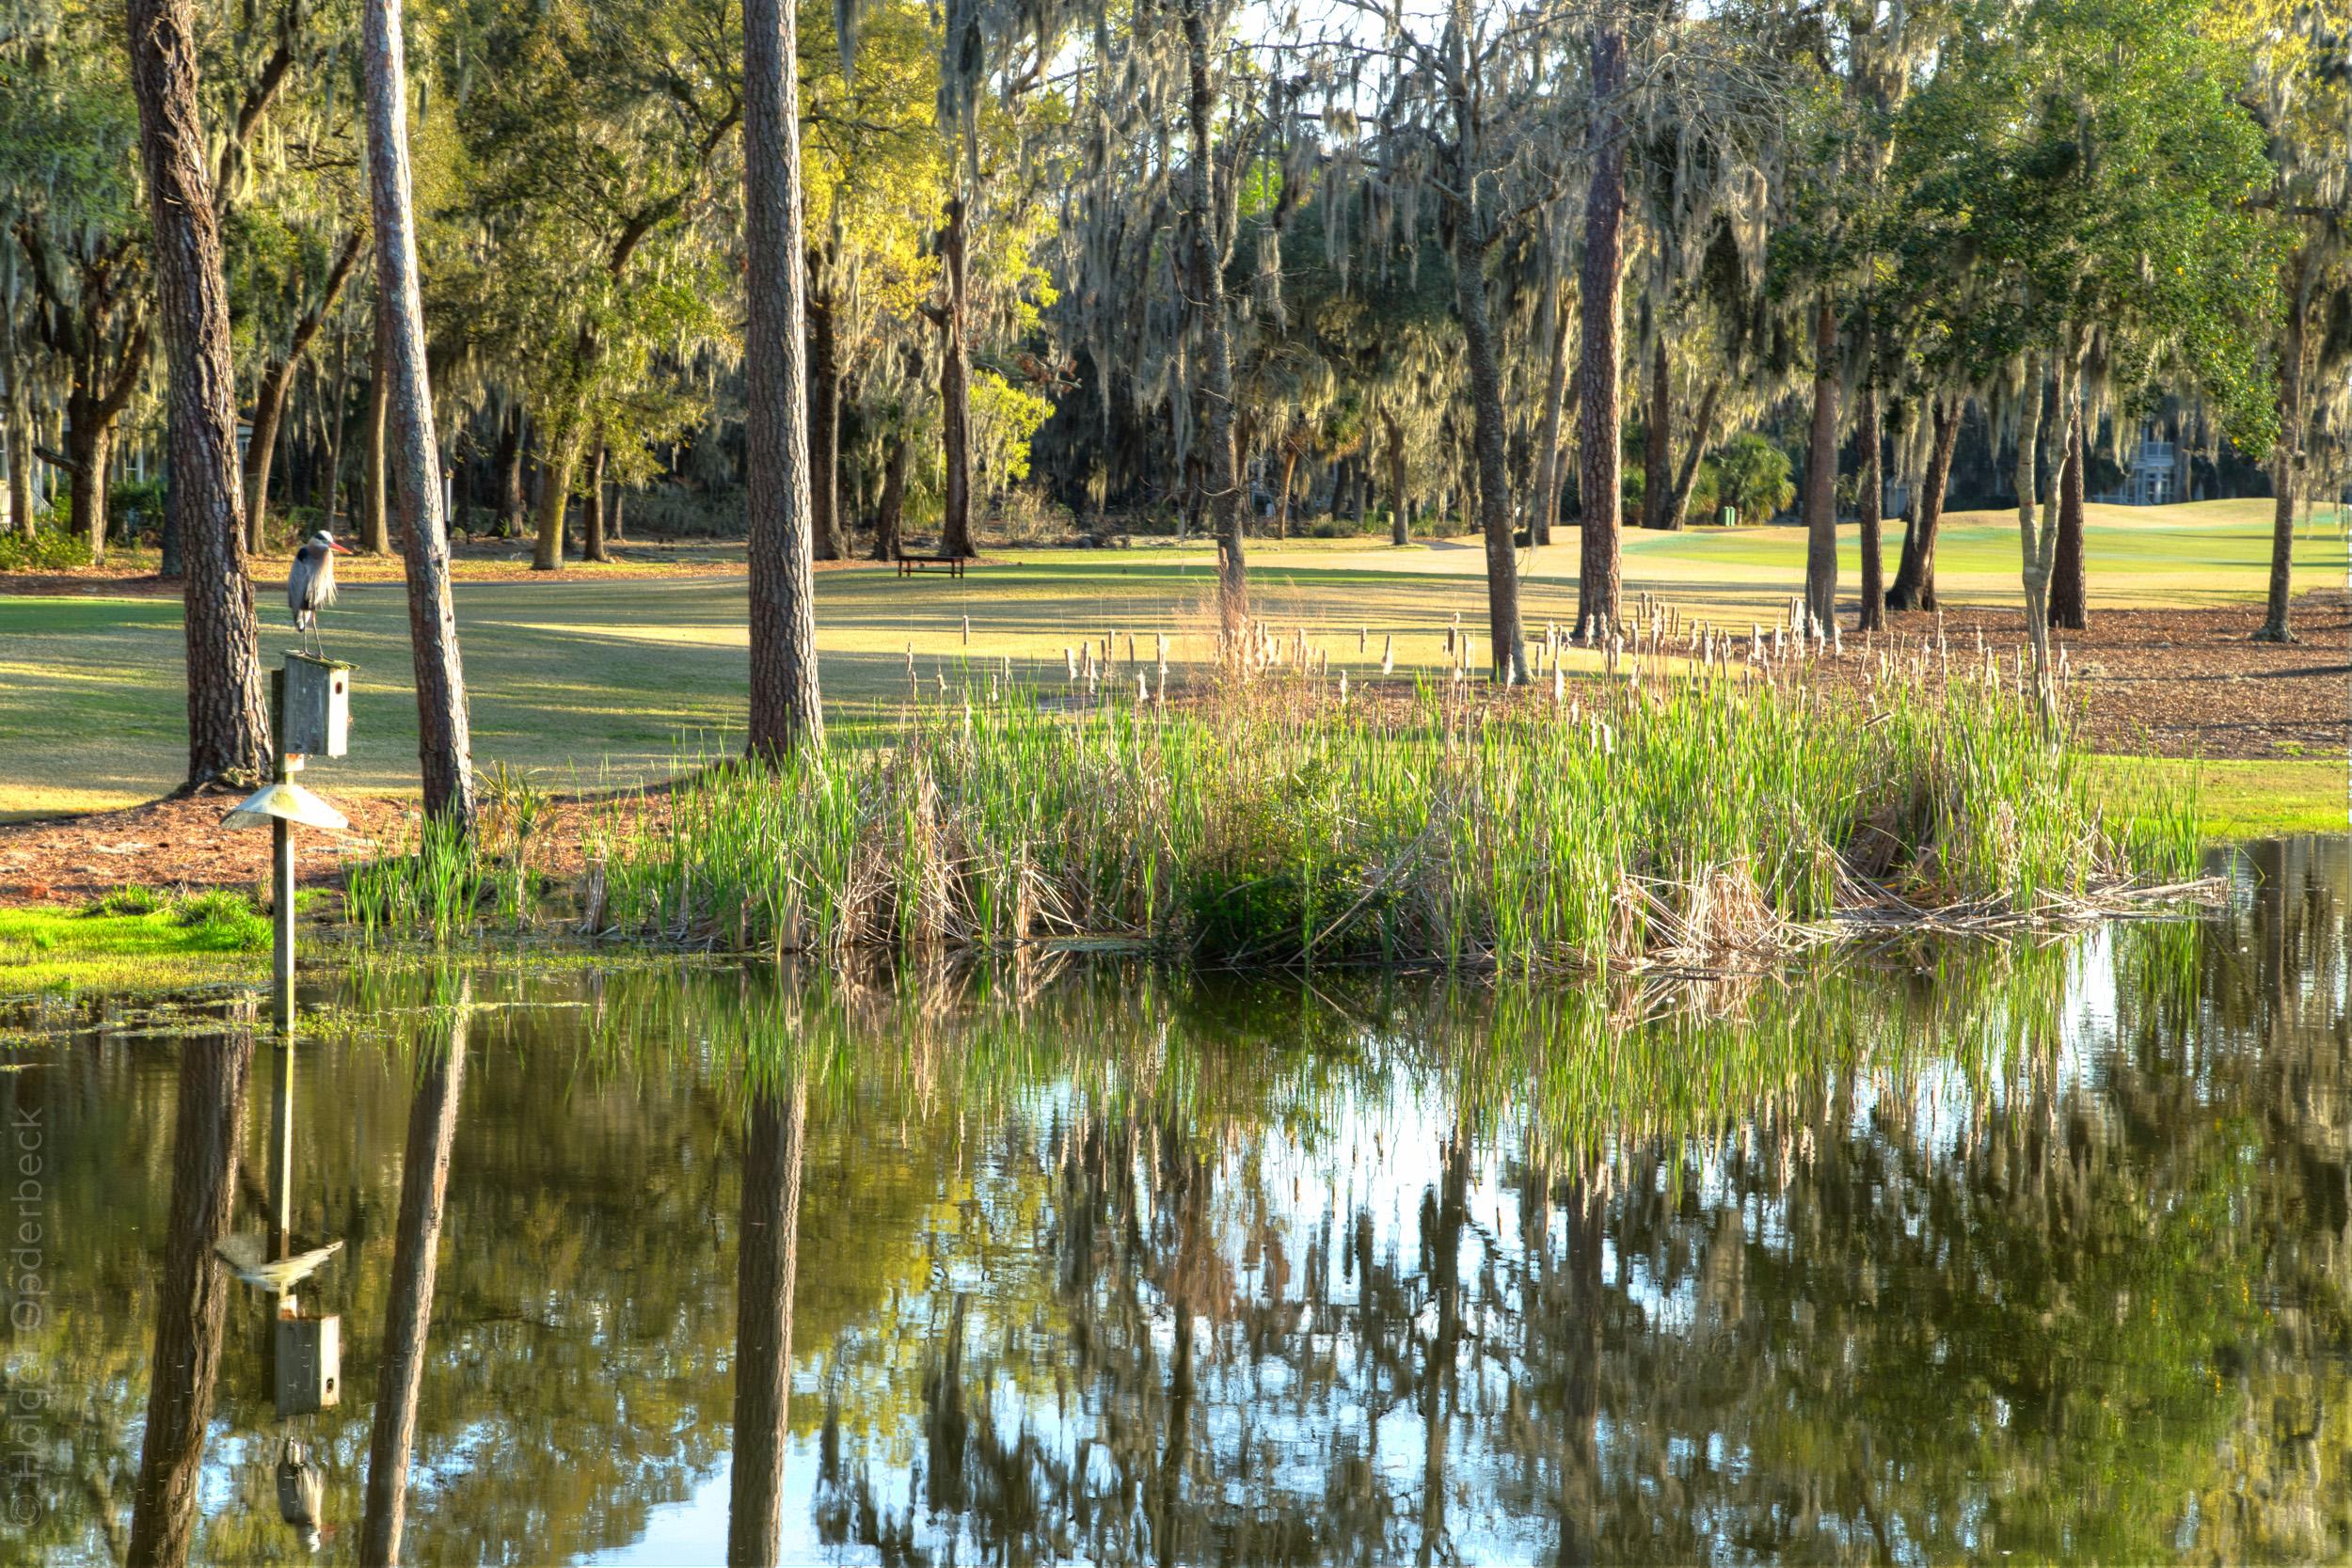 clubhouse-pond-grasses-bird-PS2.jpg